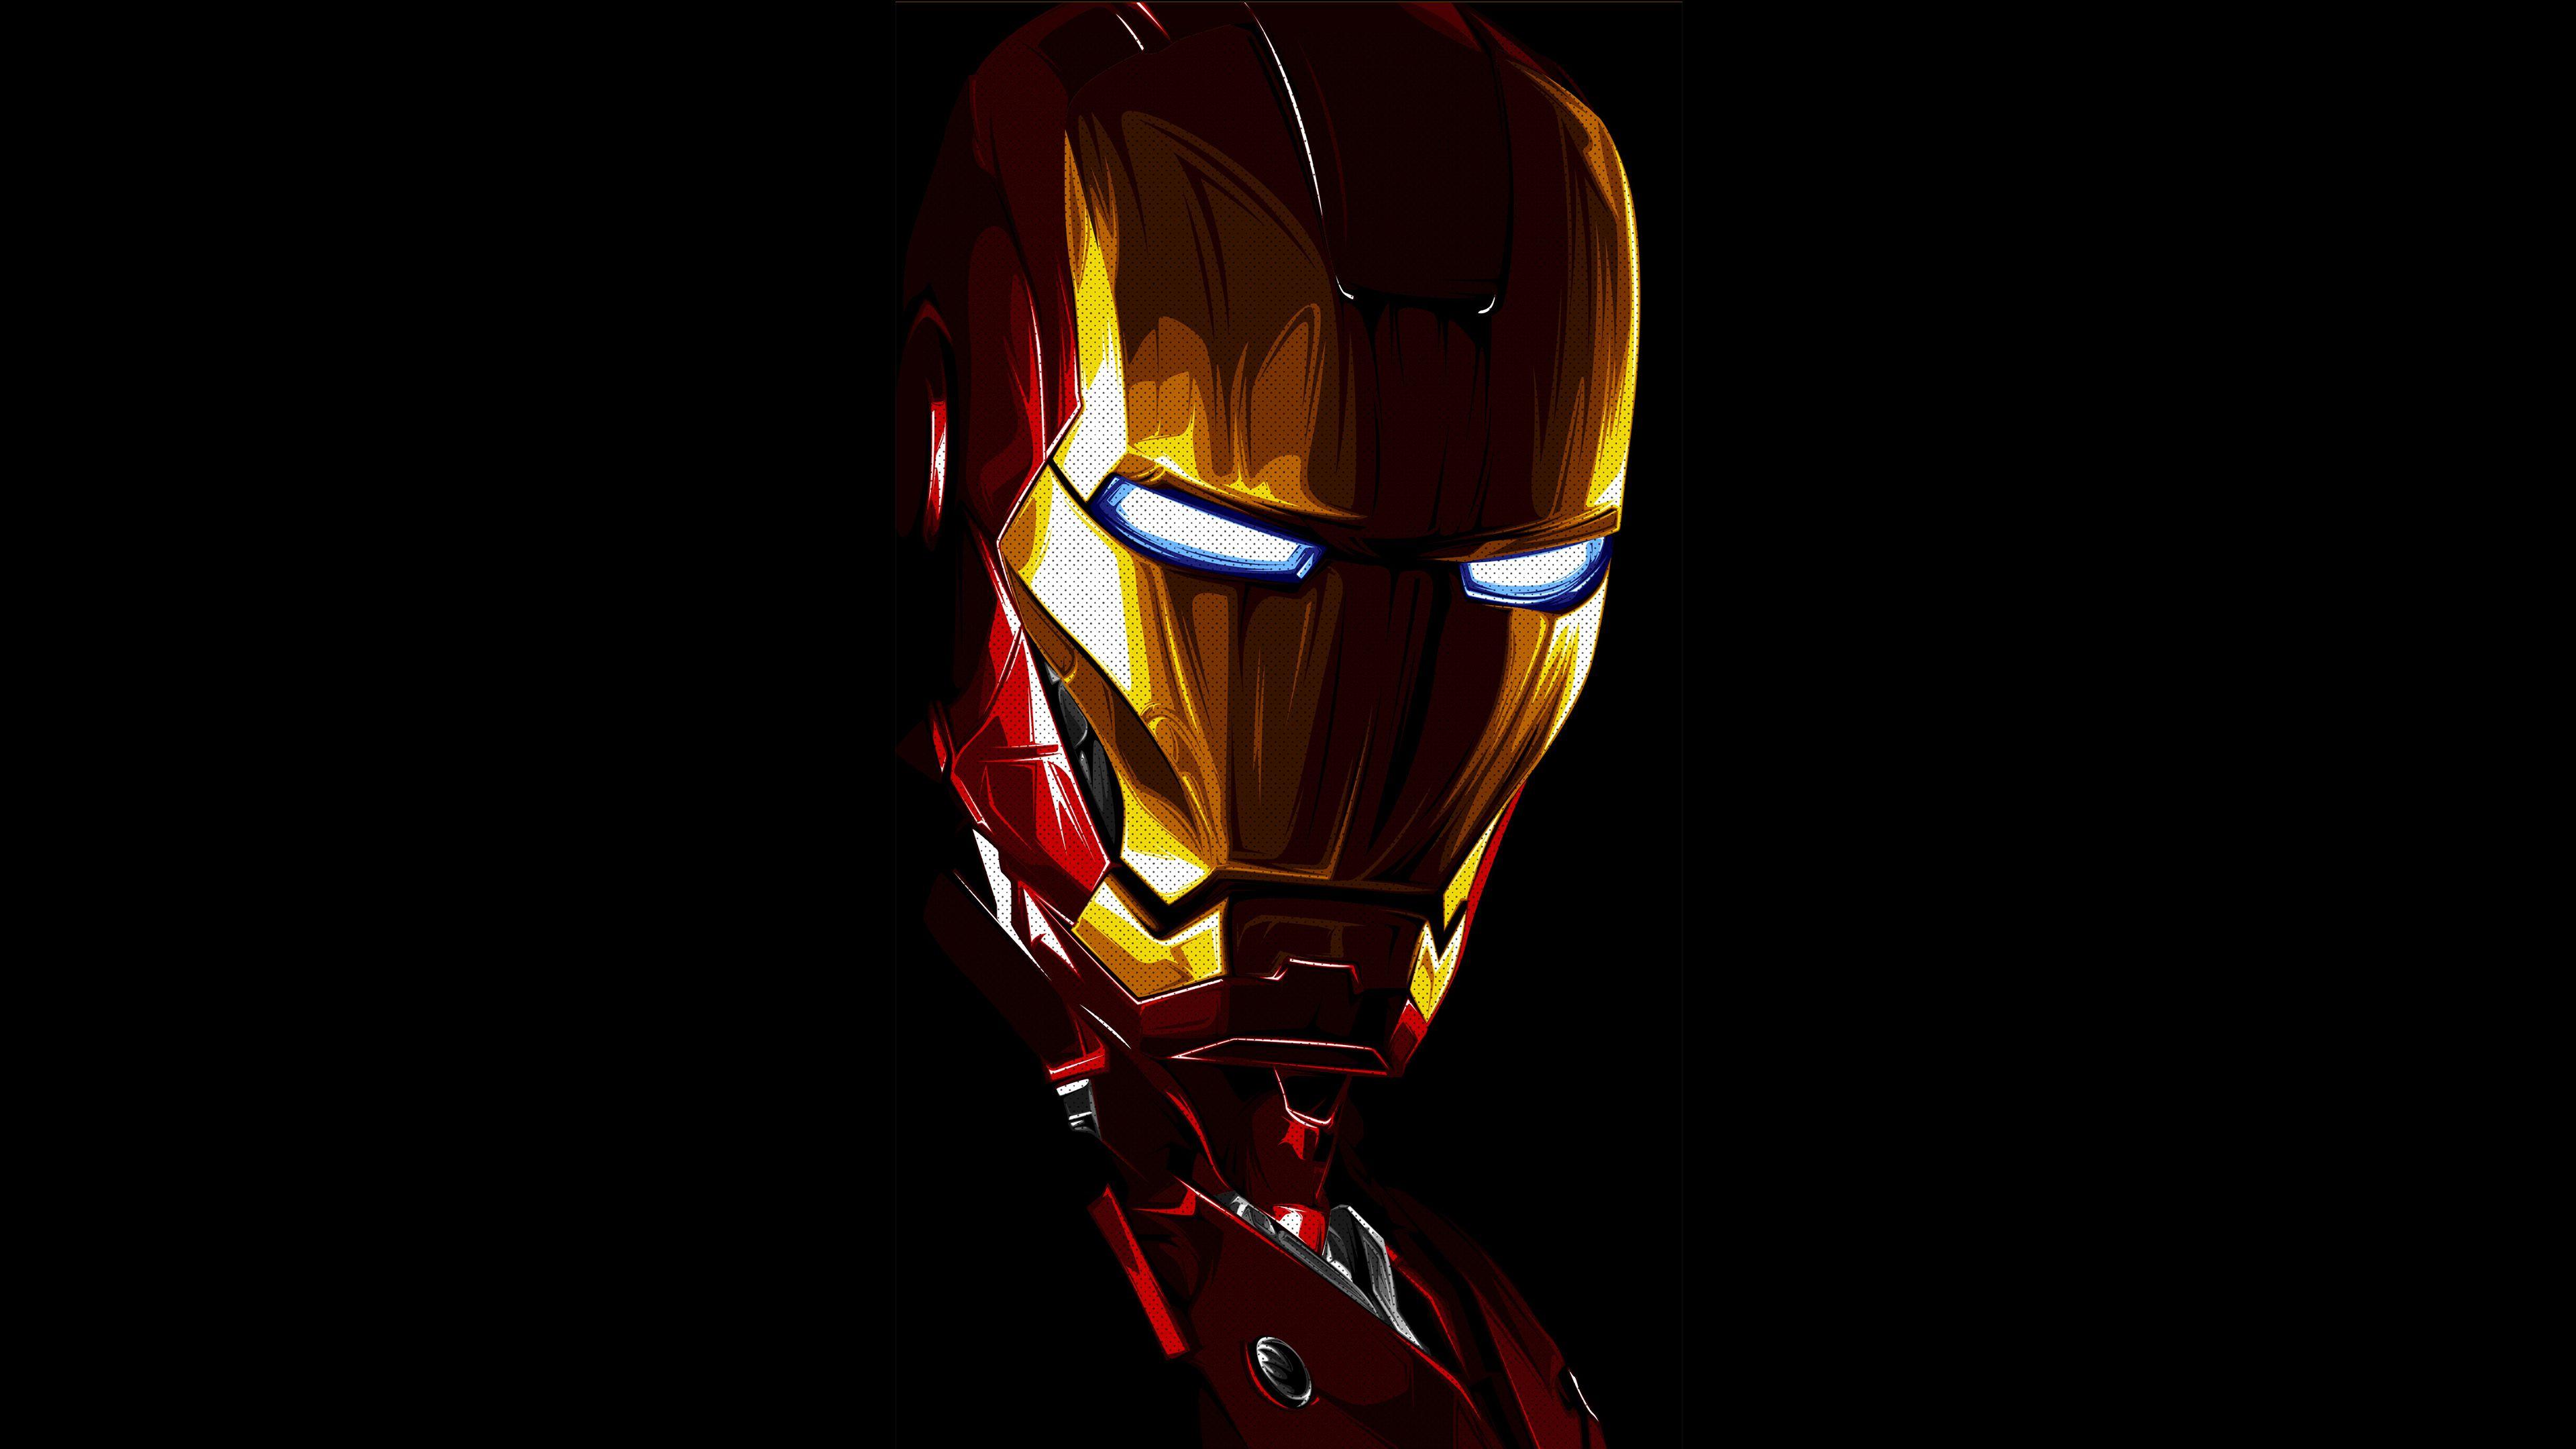 Iron Man 4k New Artworks Superheroes Wallpapers Iron Man Wallpapers Hd Wallpapers Digital Art Wallpape Iron Man Wallpaper Man Wallpaper Hd Nature Wallpapers